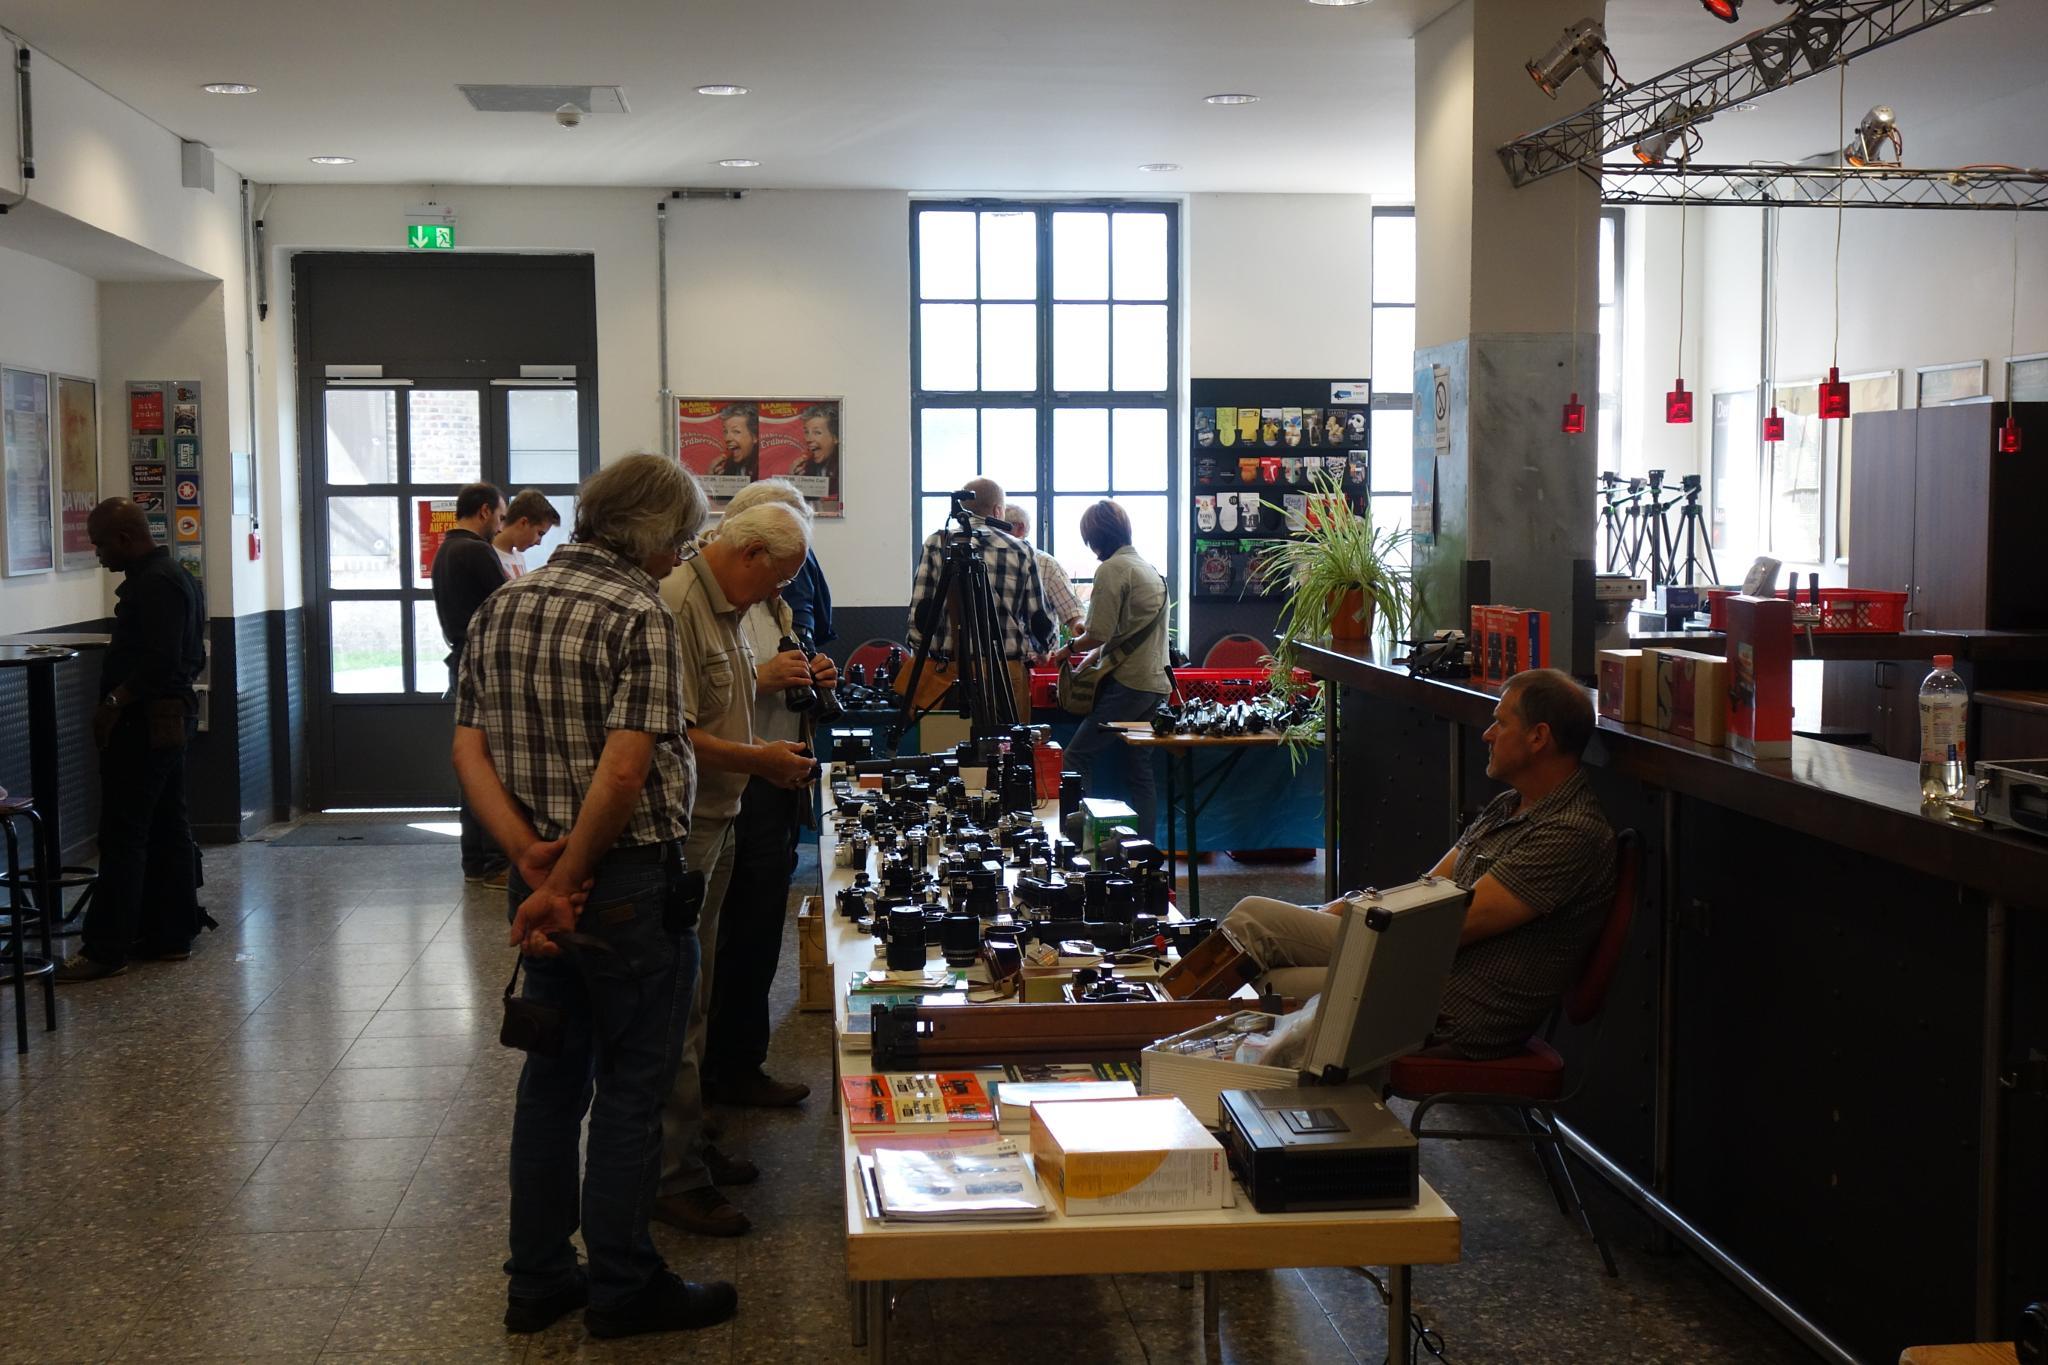 Photo Boerse Essen 2015 teil 2 by Anatoliy Ashmyanskiy